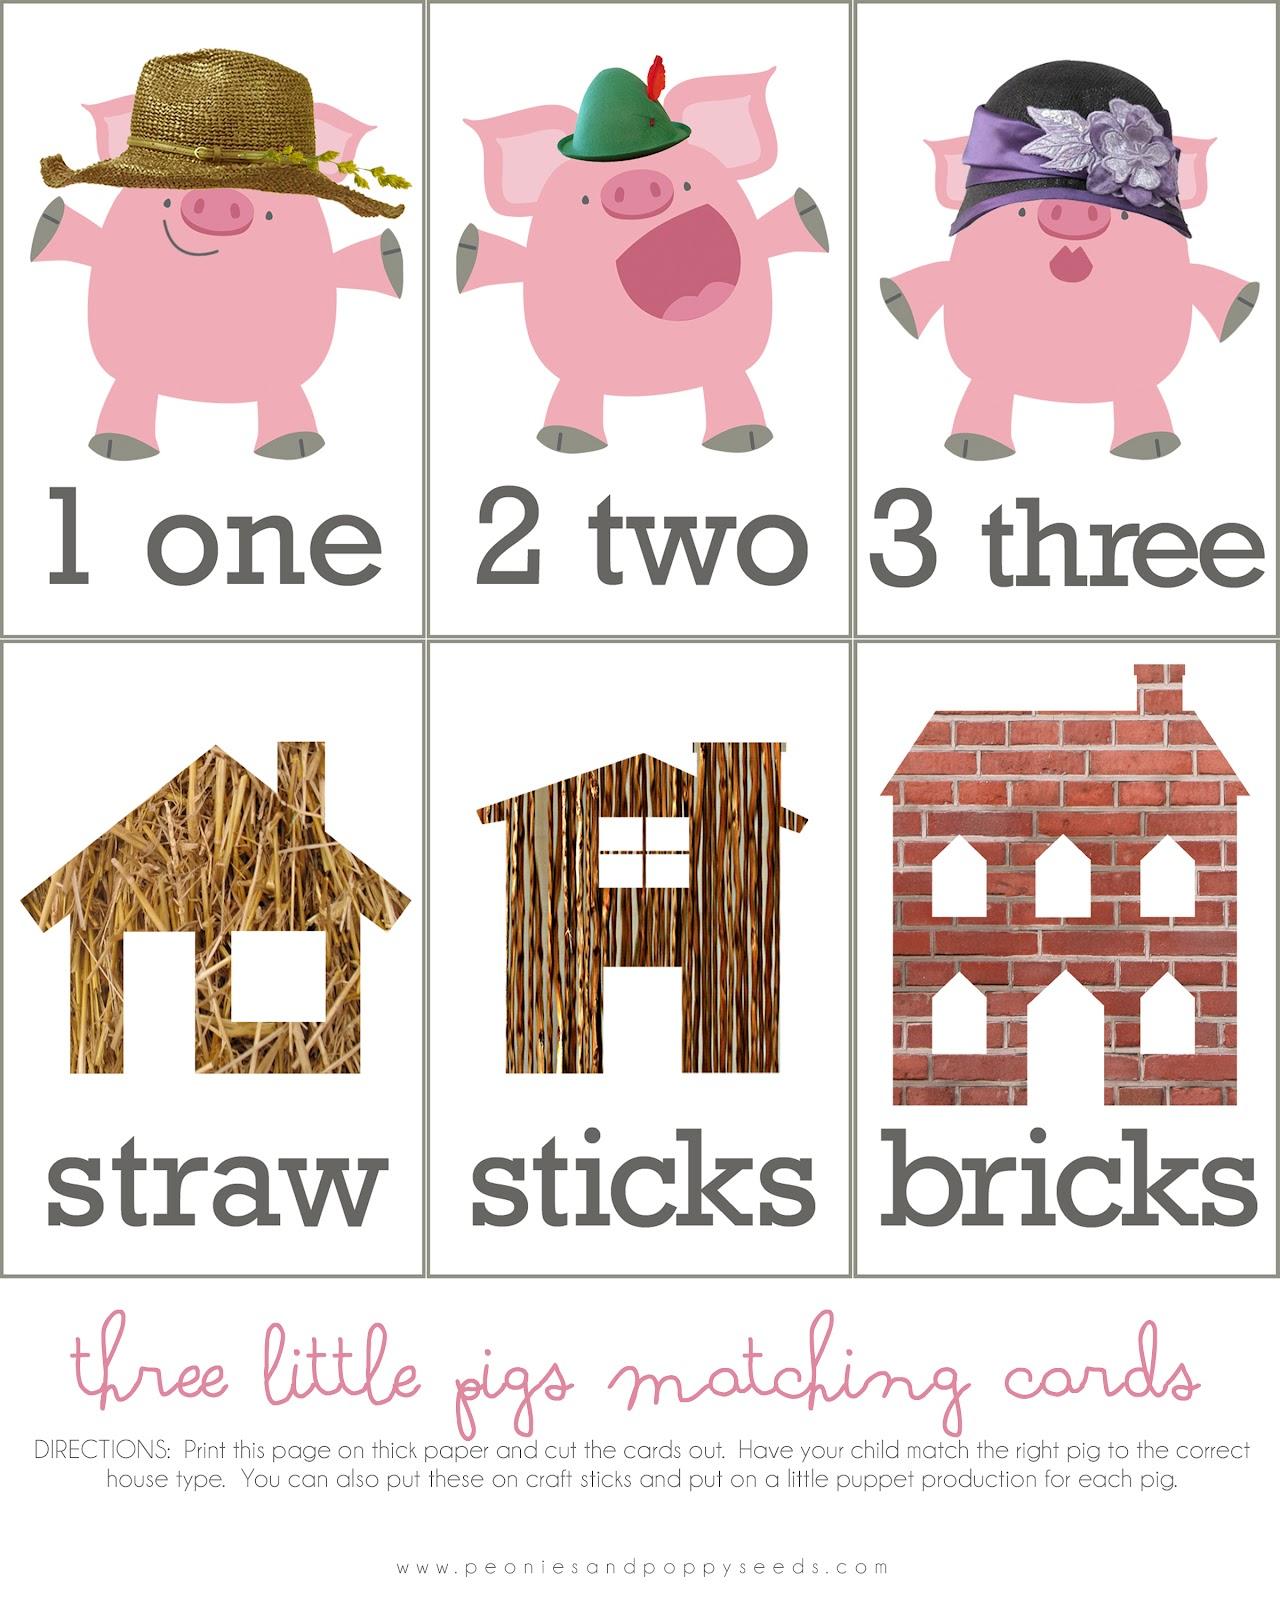 Three little pigs activity.